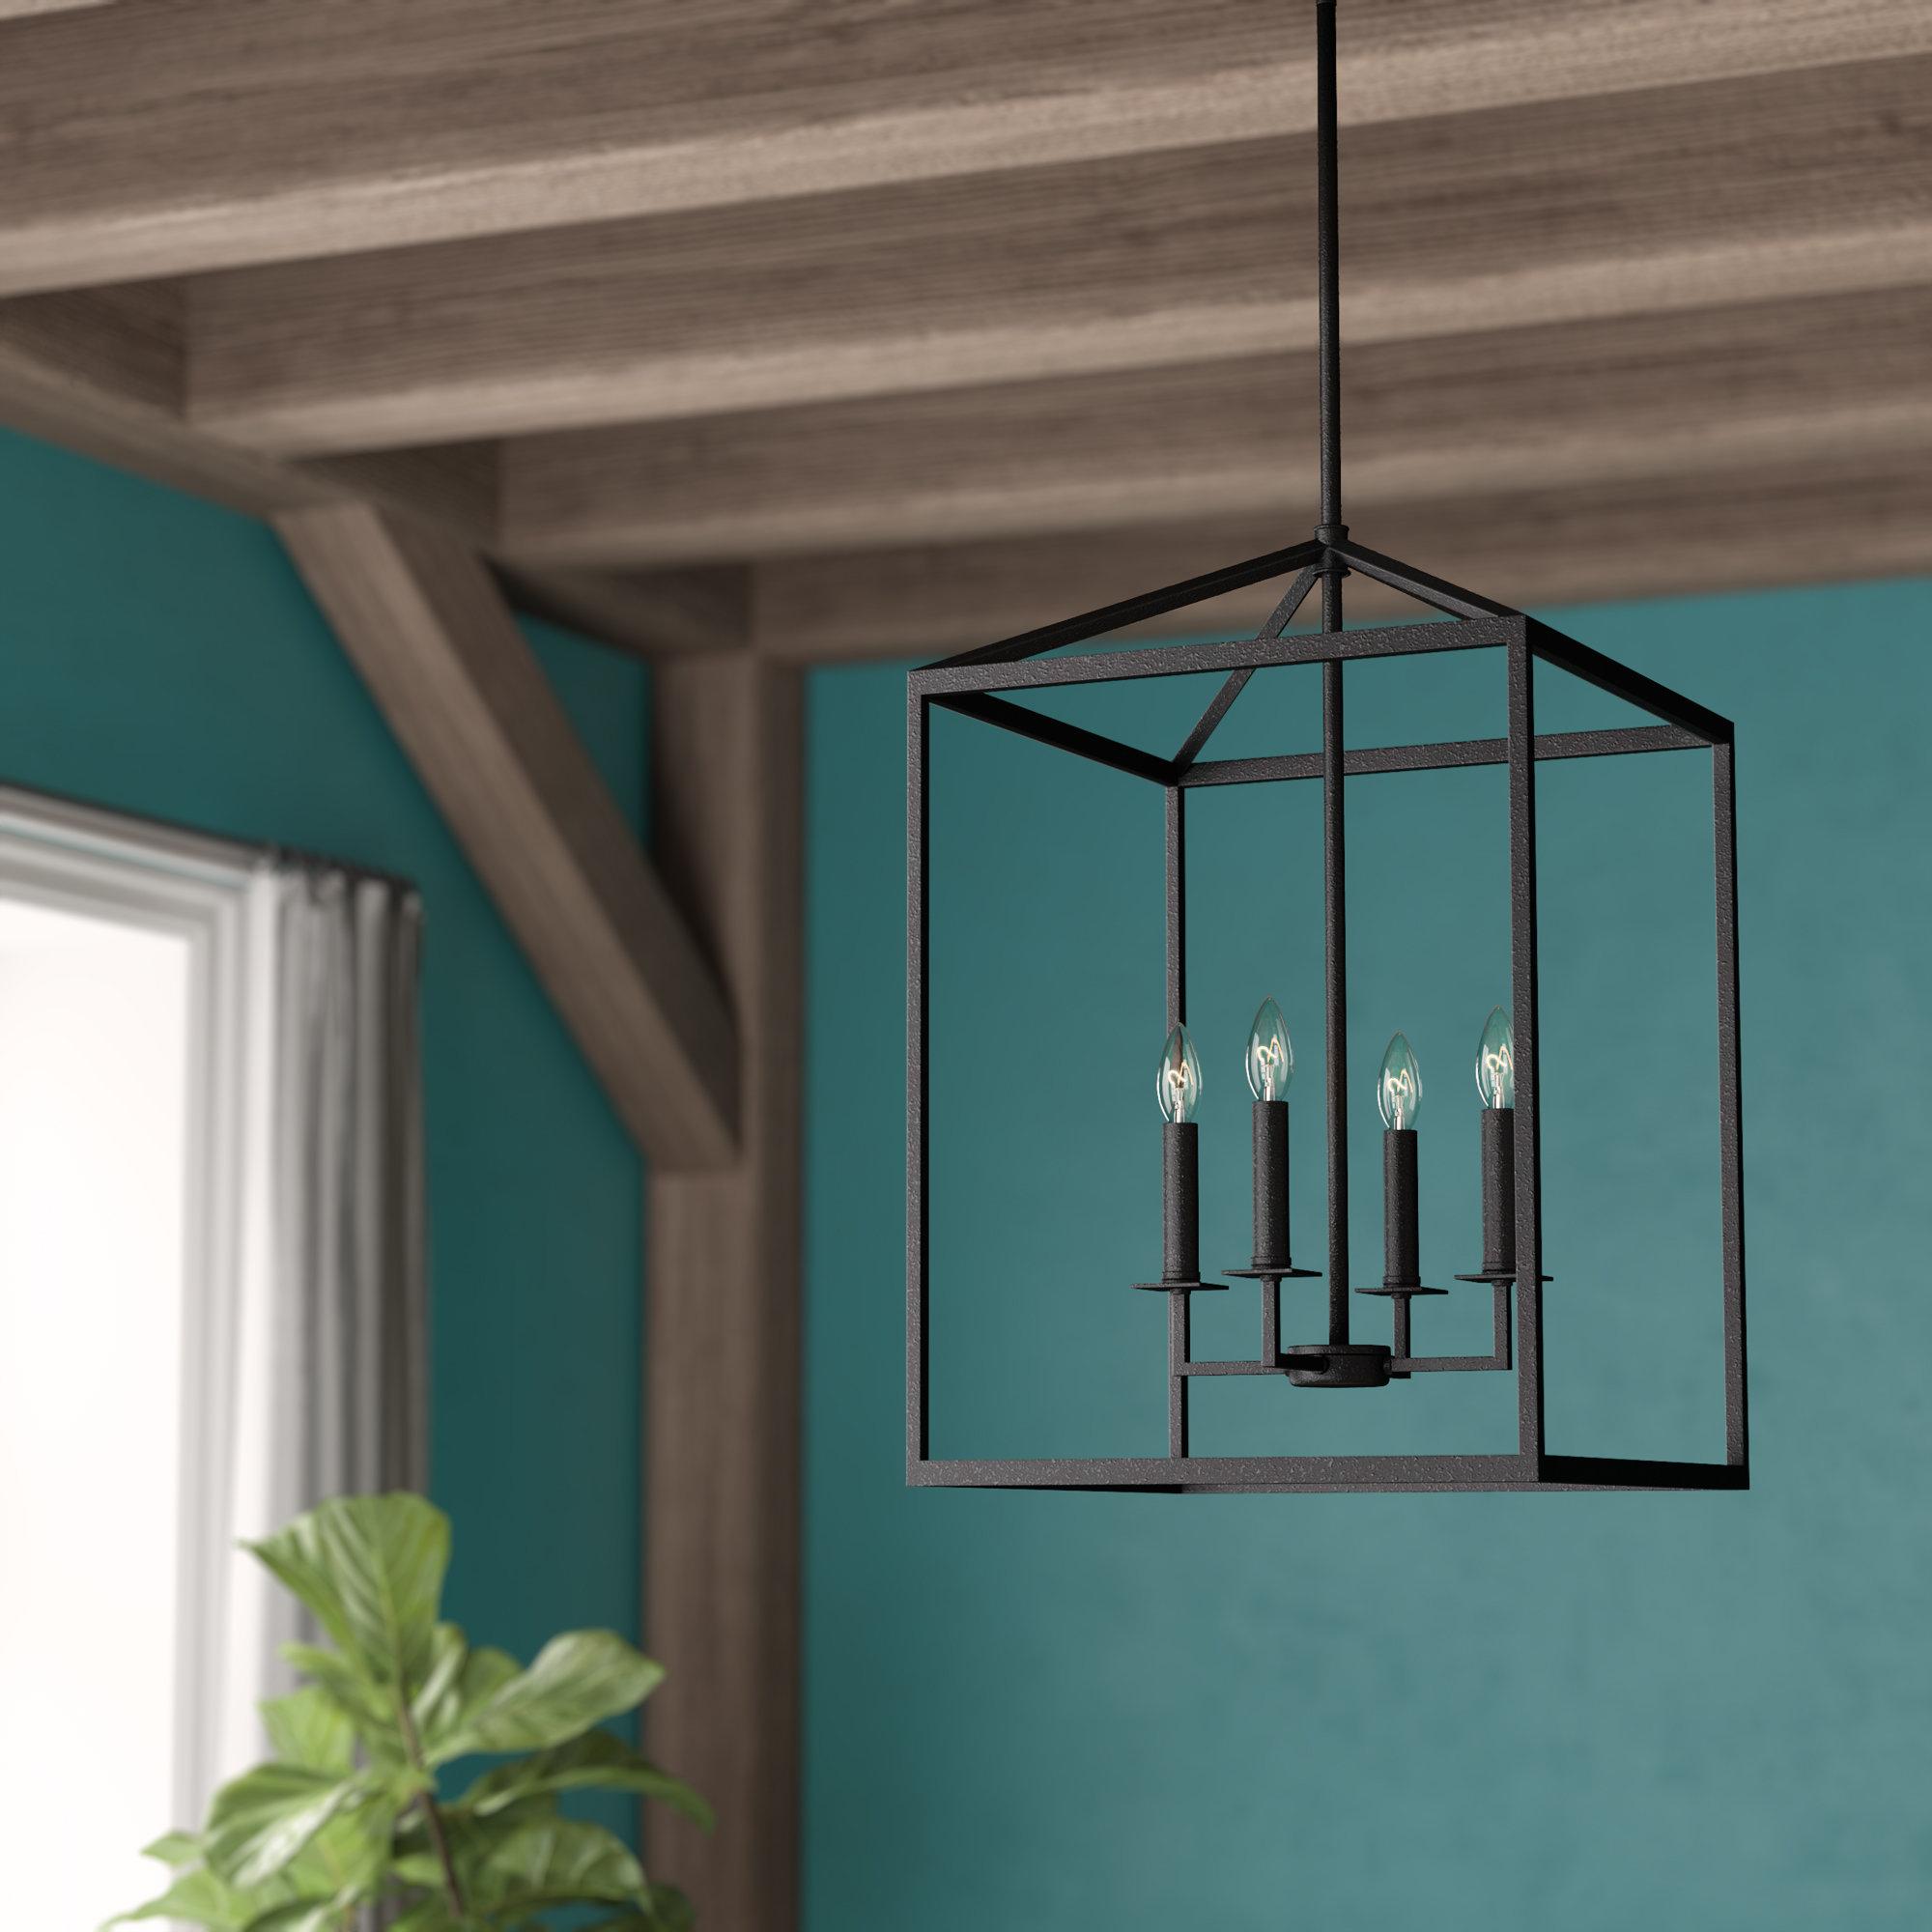 Odie 4-Light Lantern Geometric Pendant inside Odie 4-Light Lantern Square Pendants (Image 16 of 30)